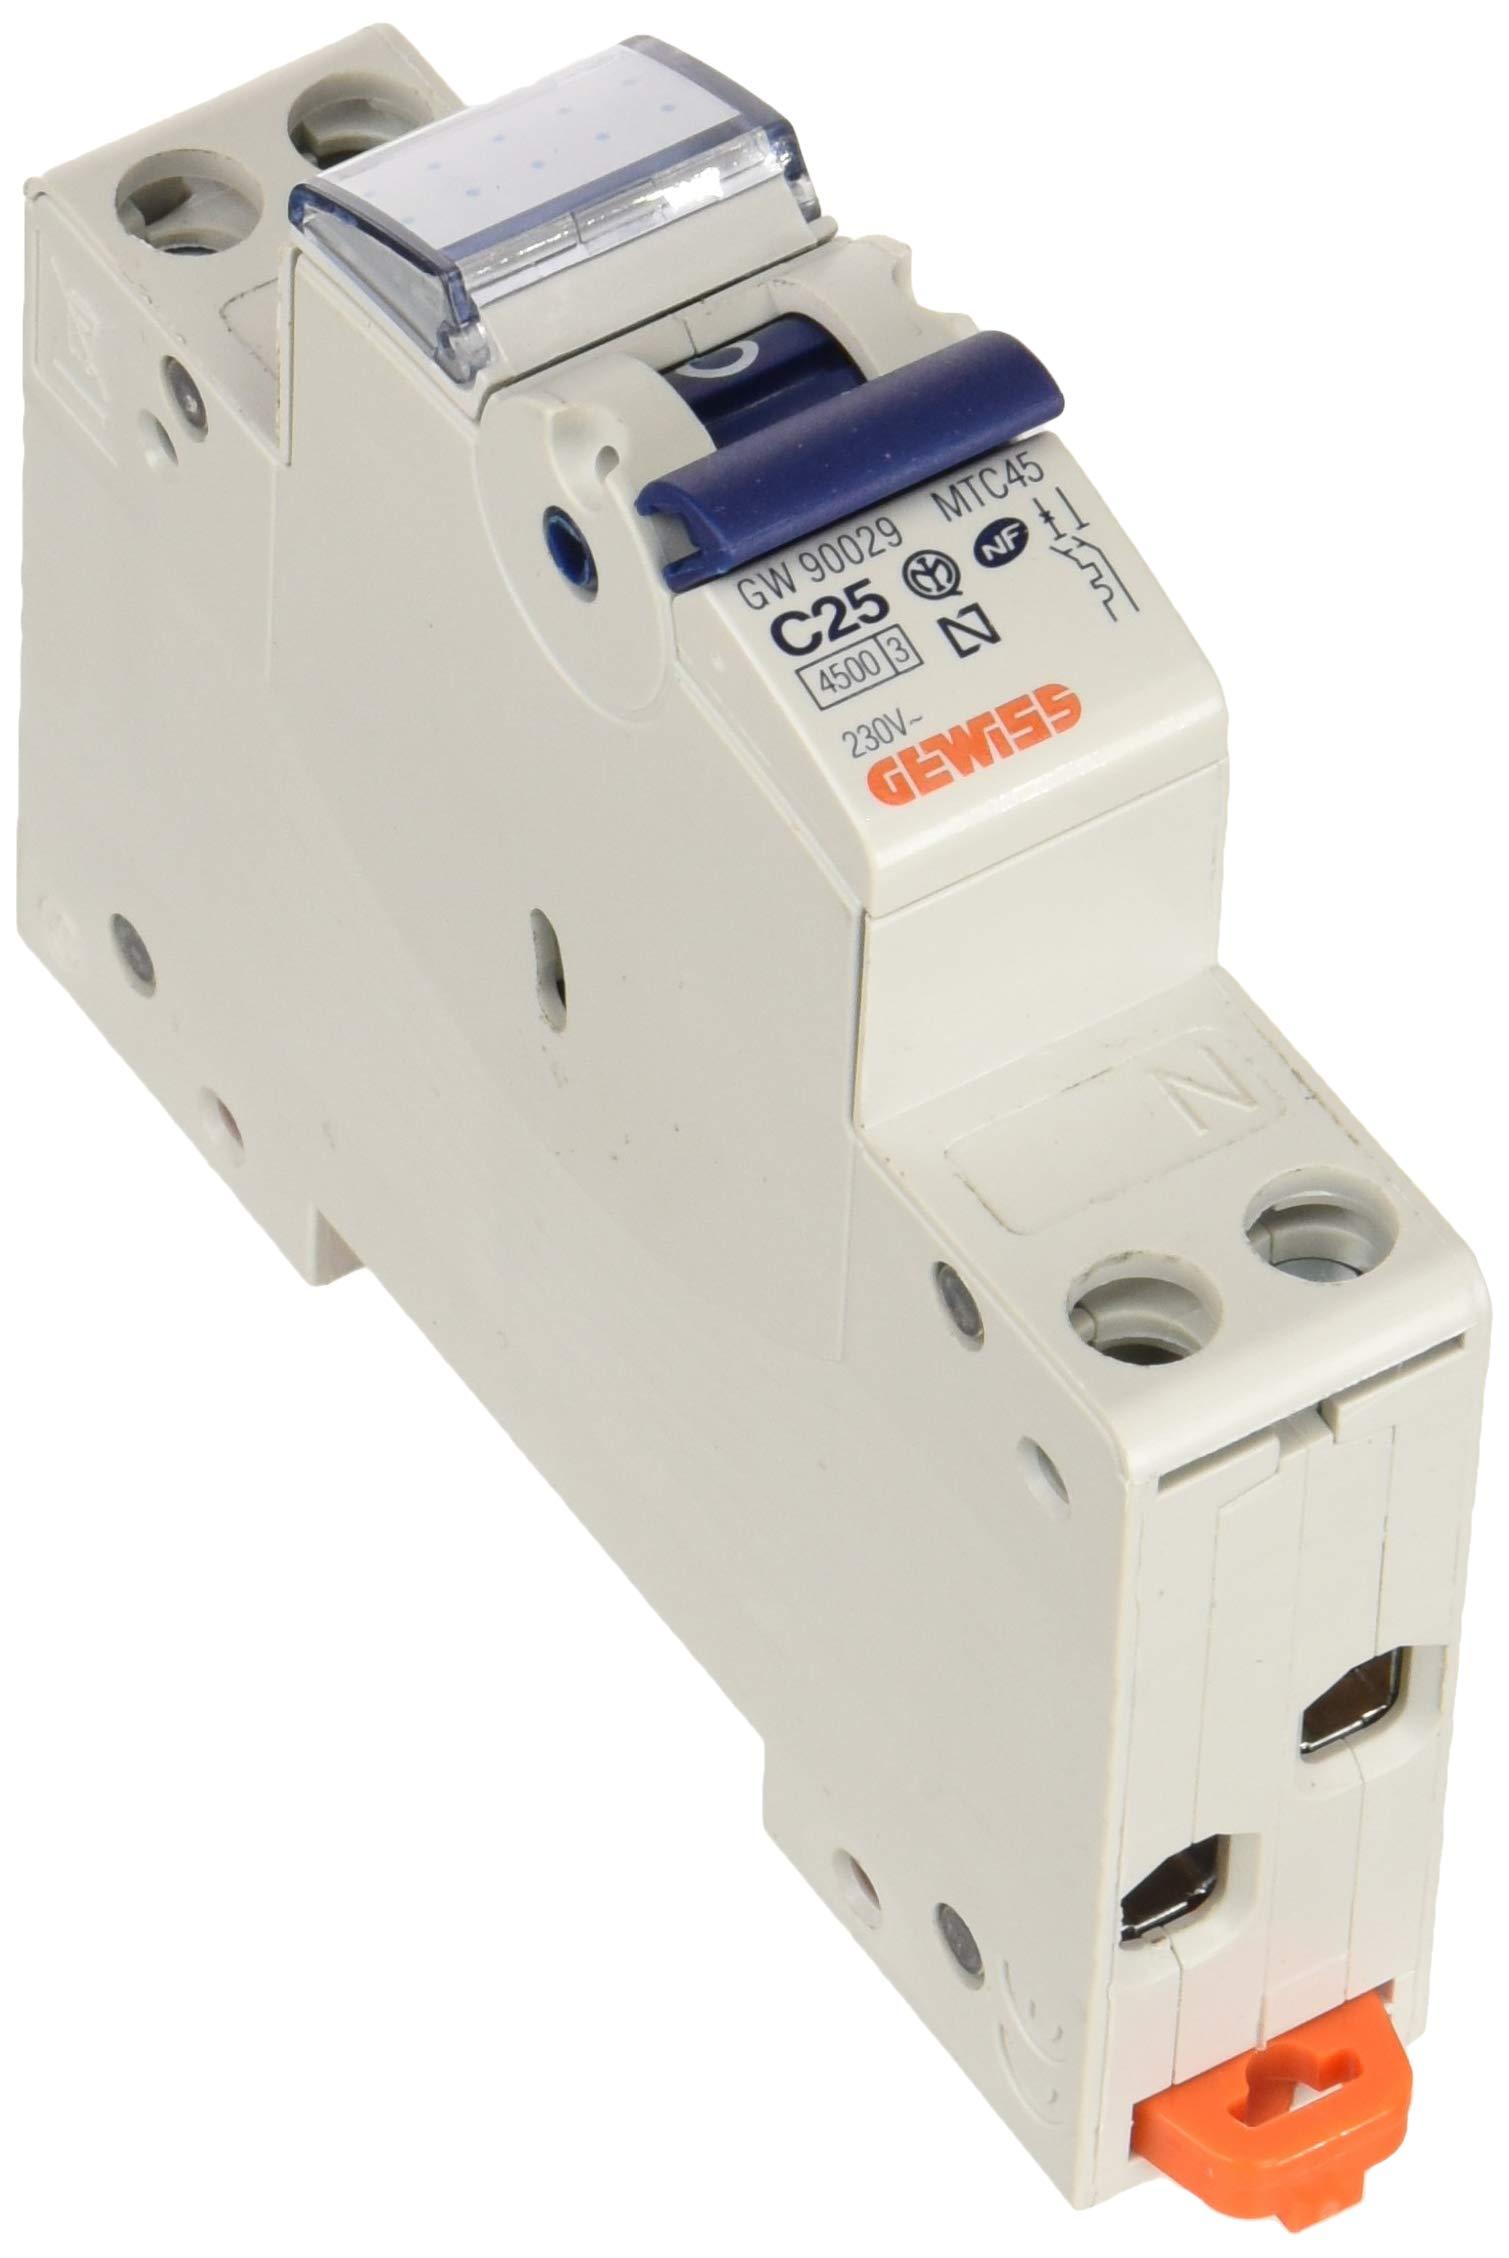 Gewiss GW90025 GW90025 Automatic Fuses ABB Circuit Breaker Automatic